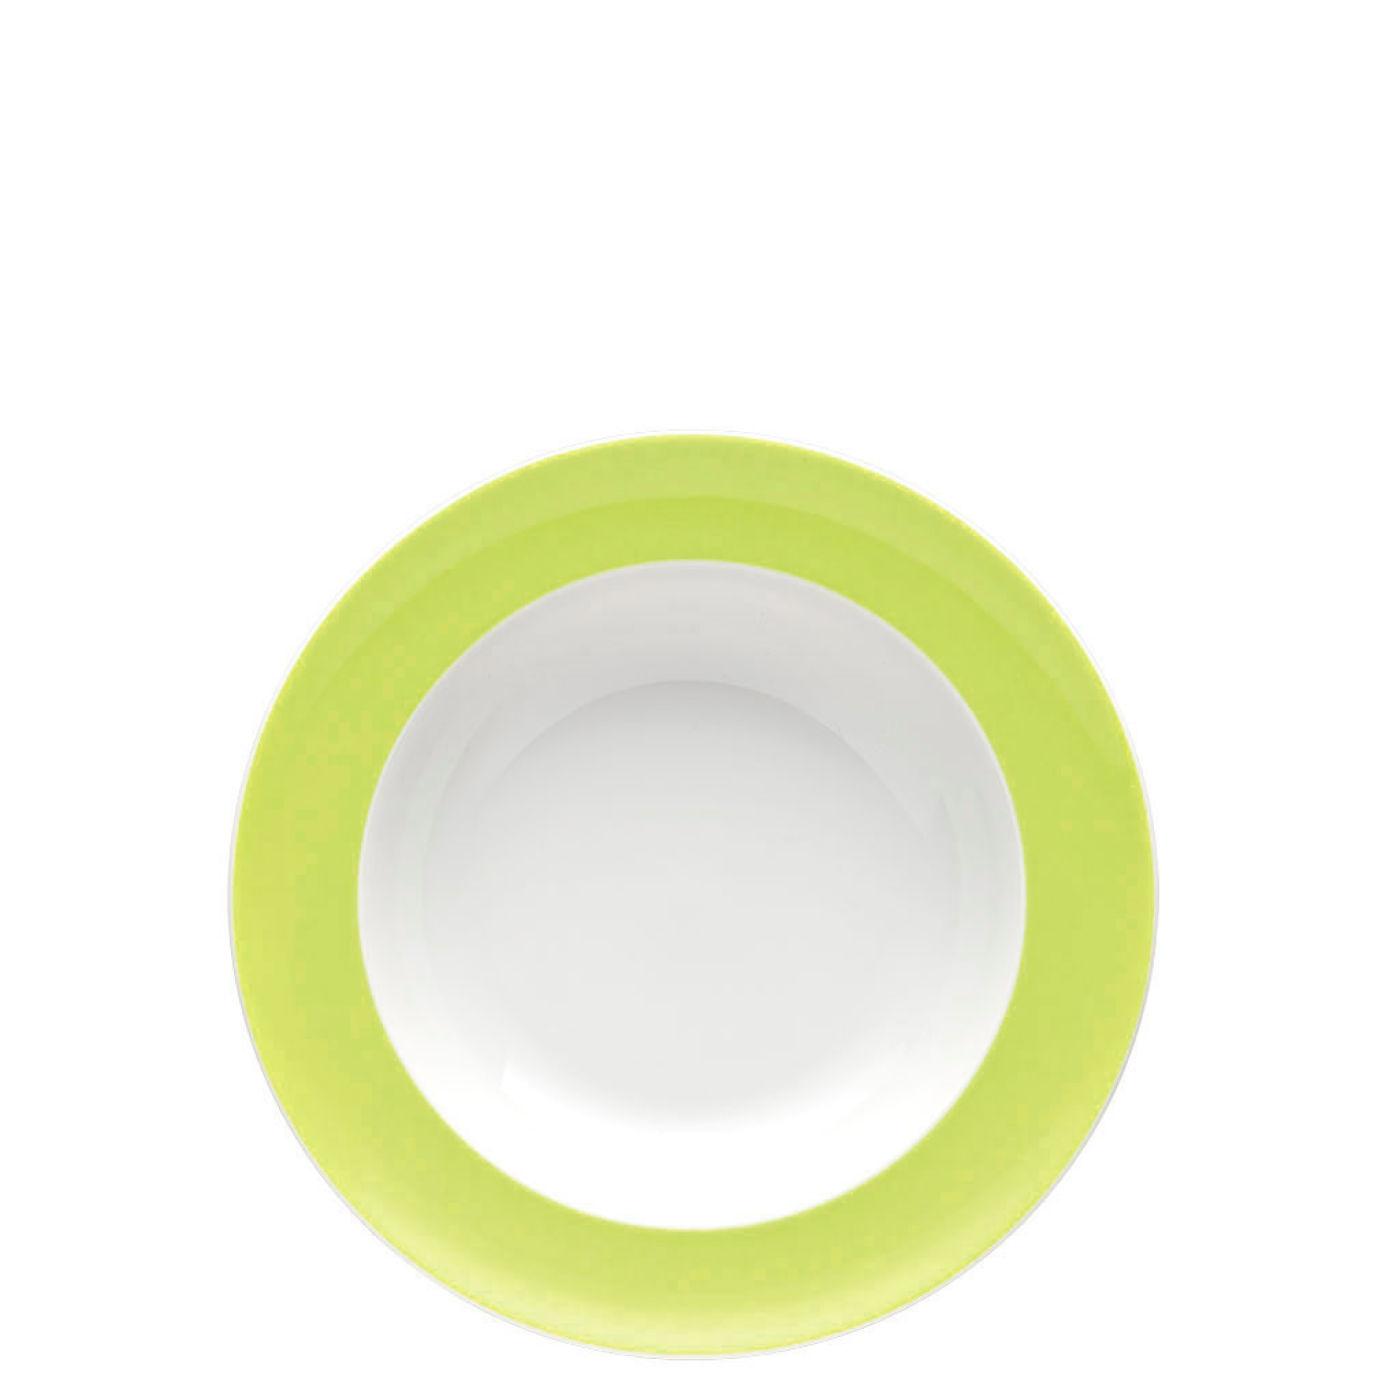 Набор столовый на 2 персоны Rosenthal SUNNY DAY, желтый, 10 предметов Rosenthal 10850-408535-28010 фото 2